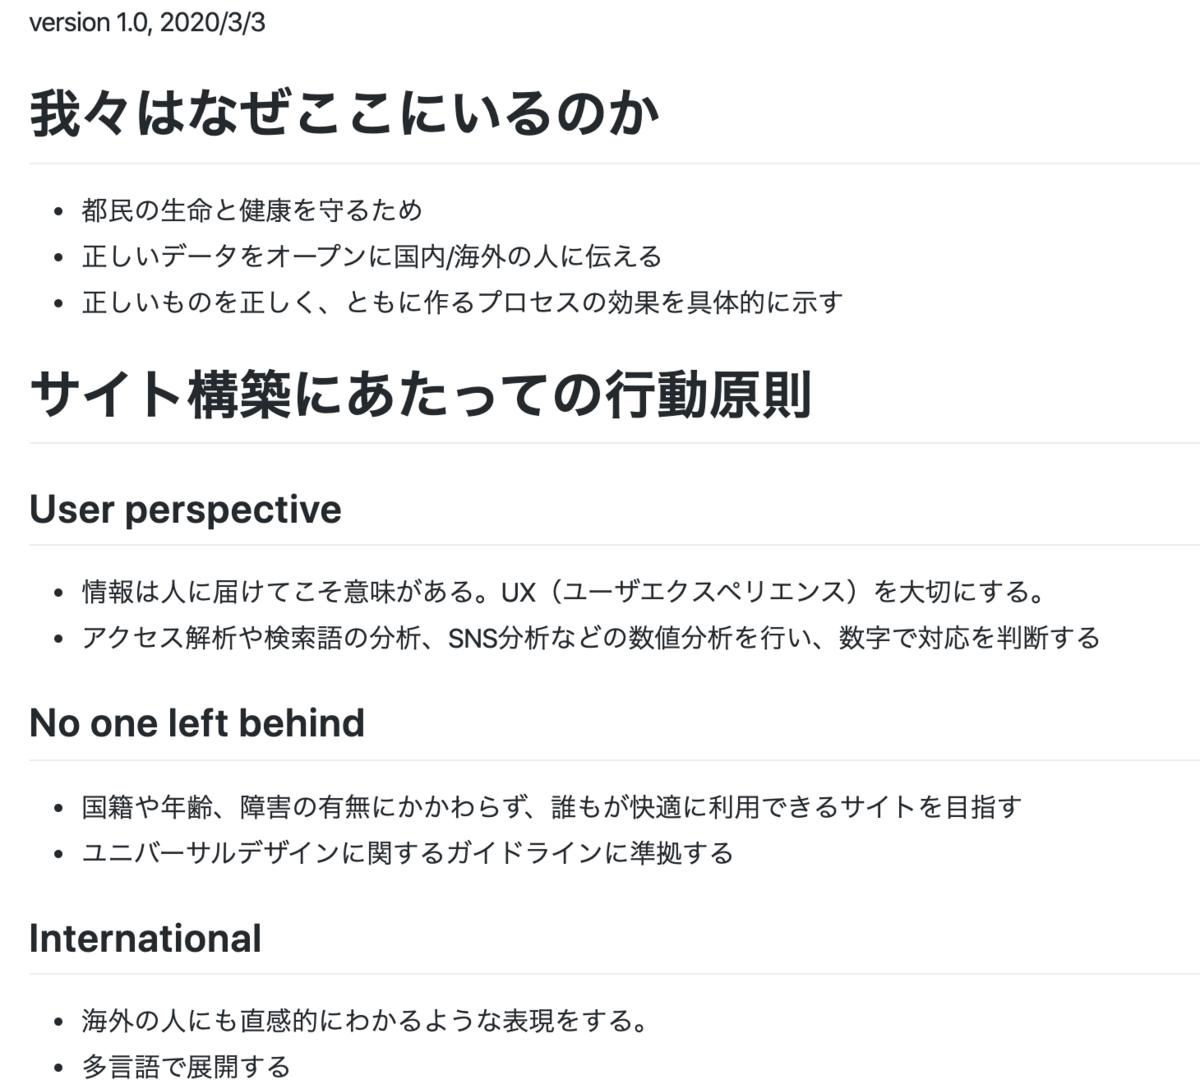 f:id:hideyoshi1537:20200304224653p:plain